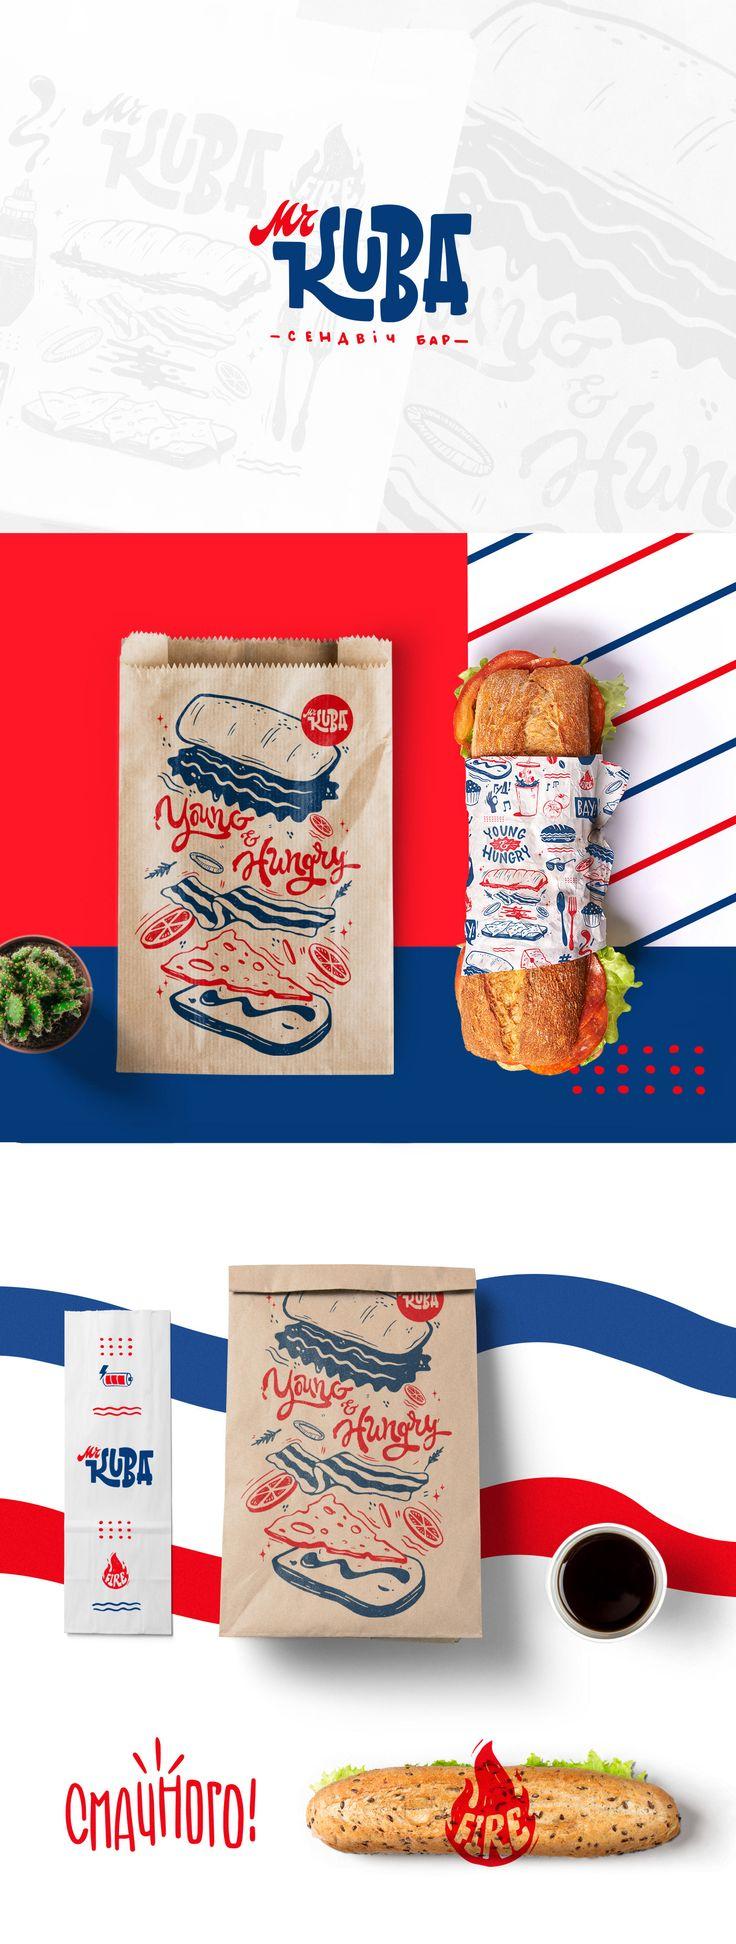 Fast food identity branding idea creative brand image